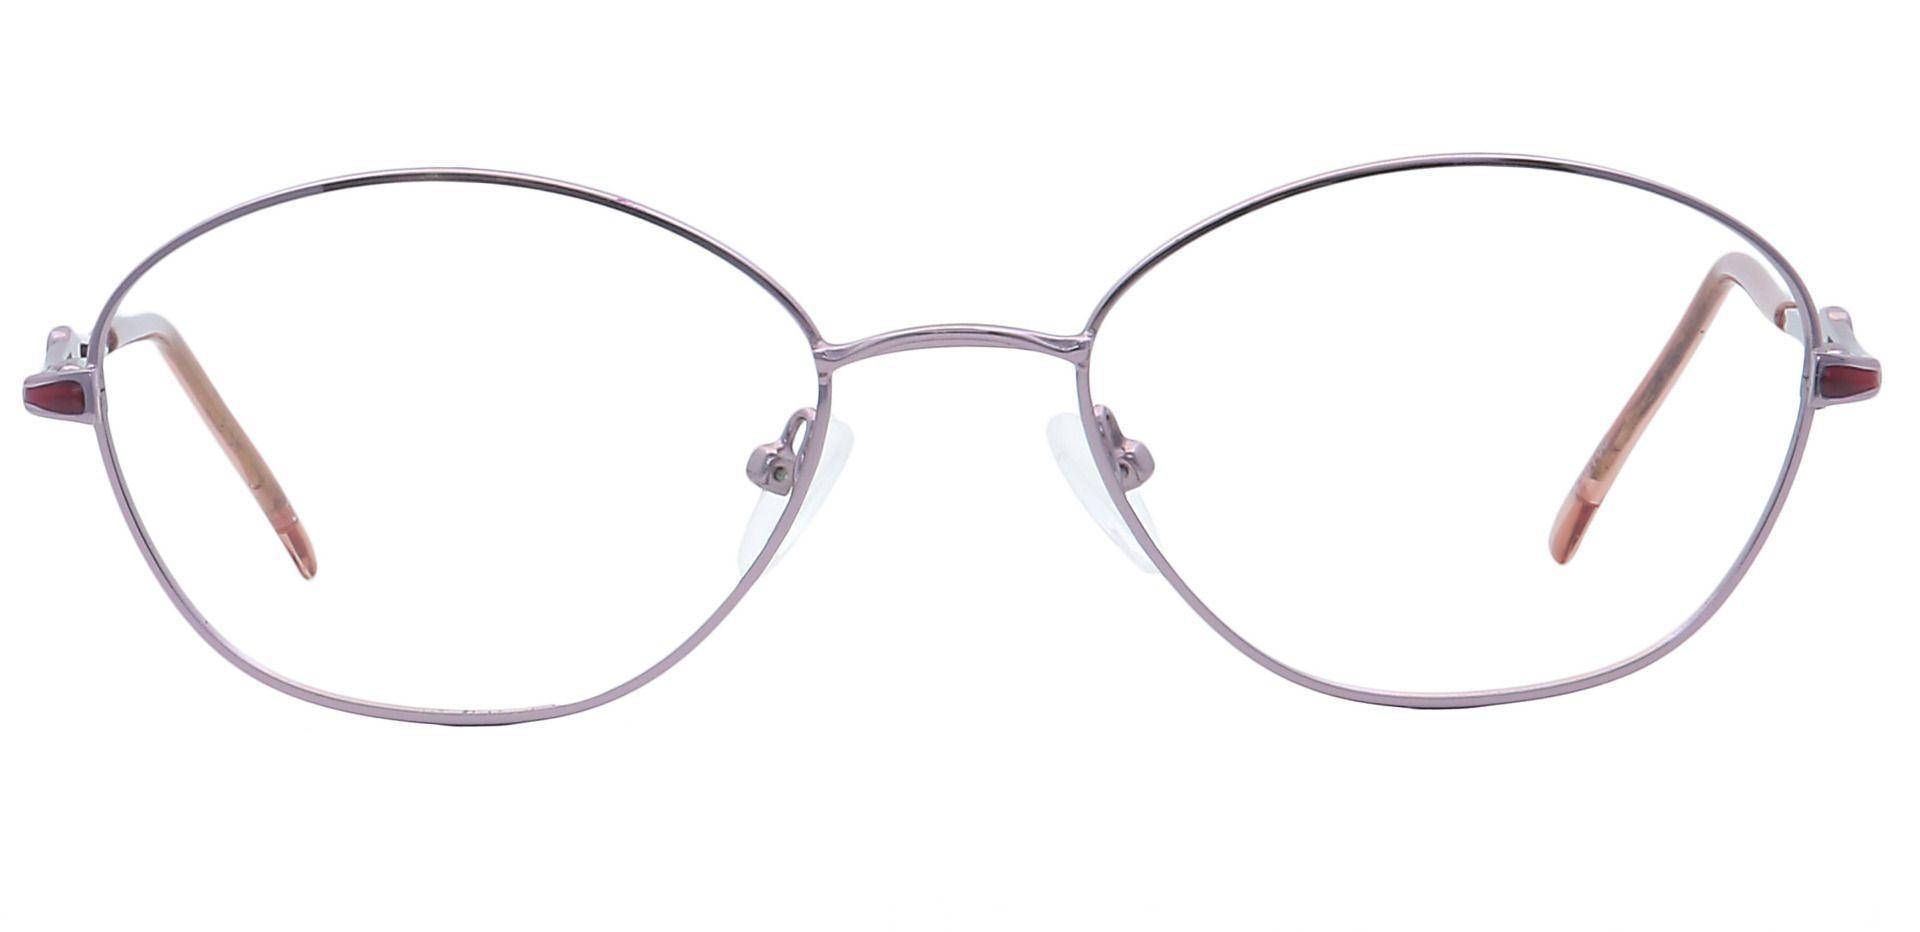 Emily Round Prescription Glasses - Yellow